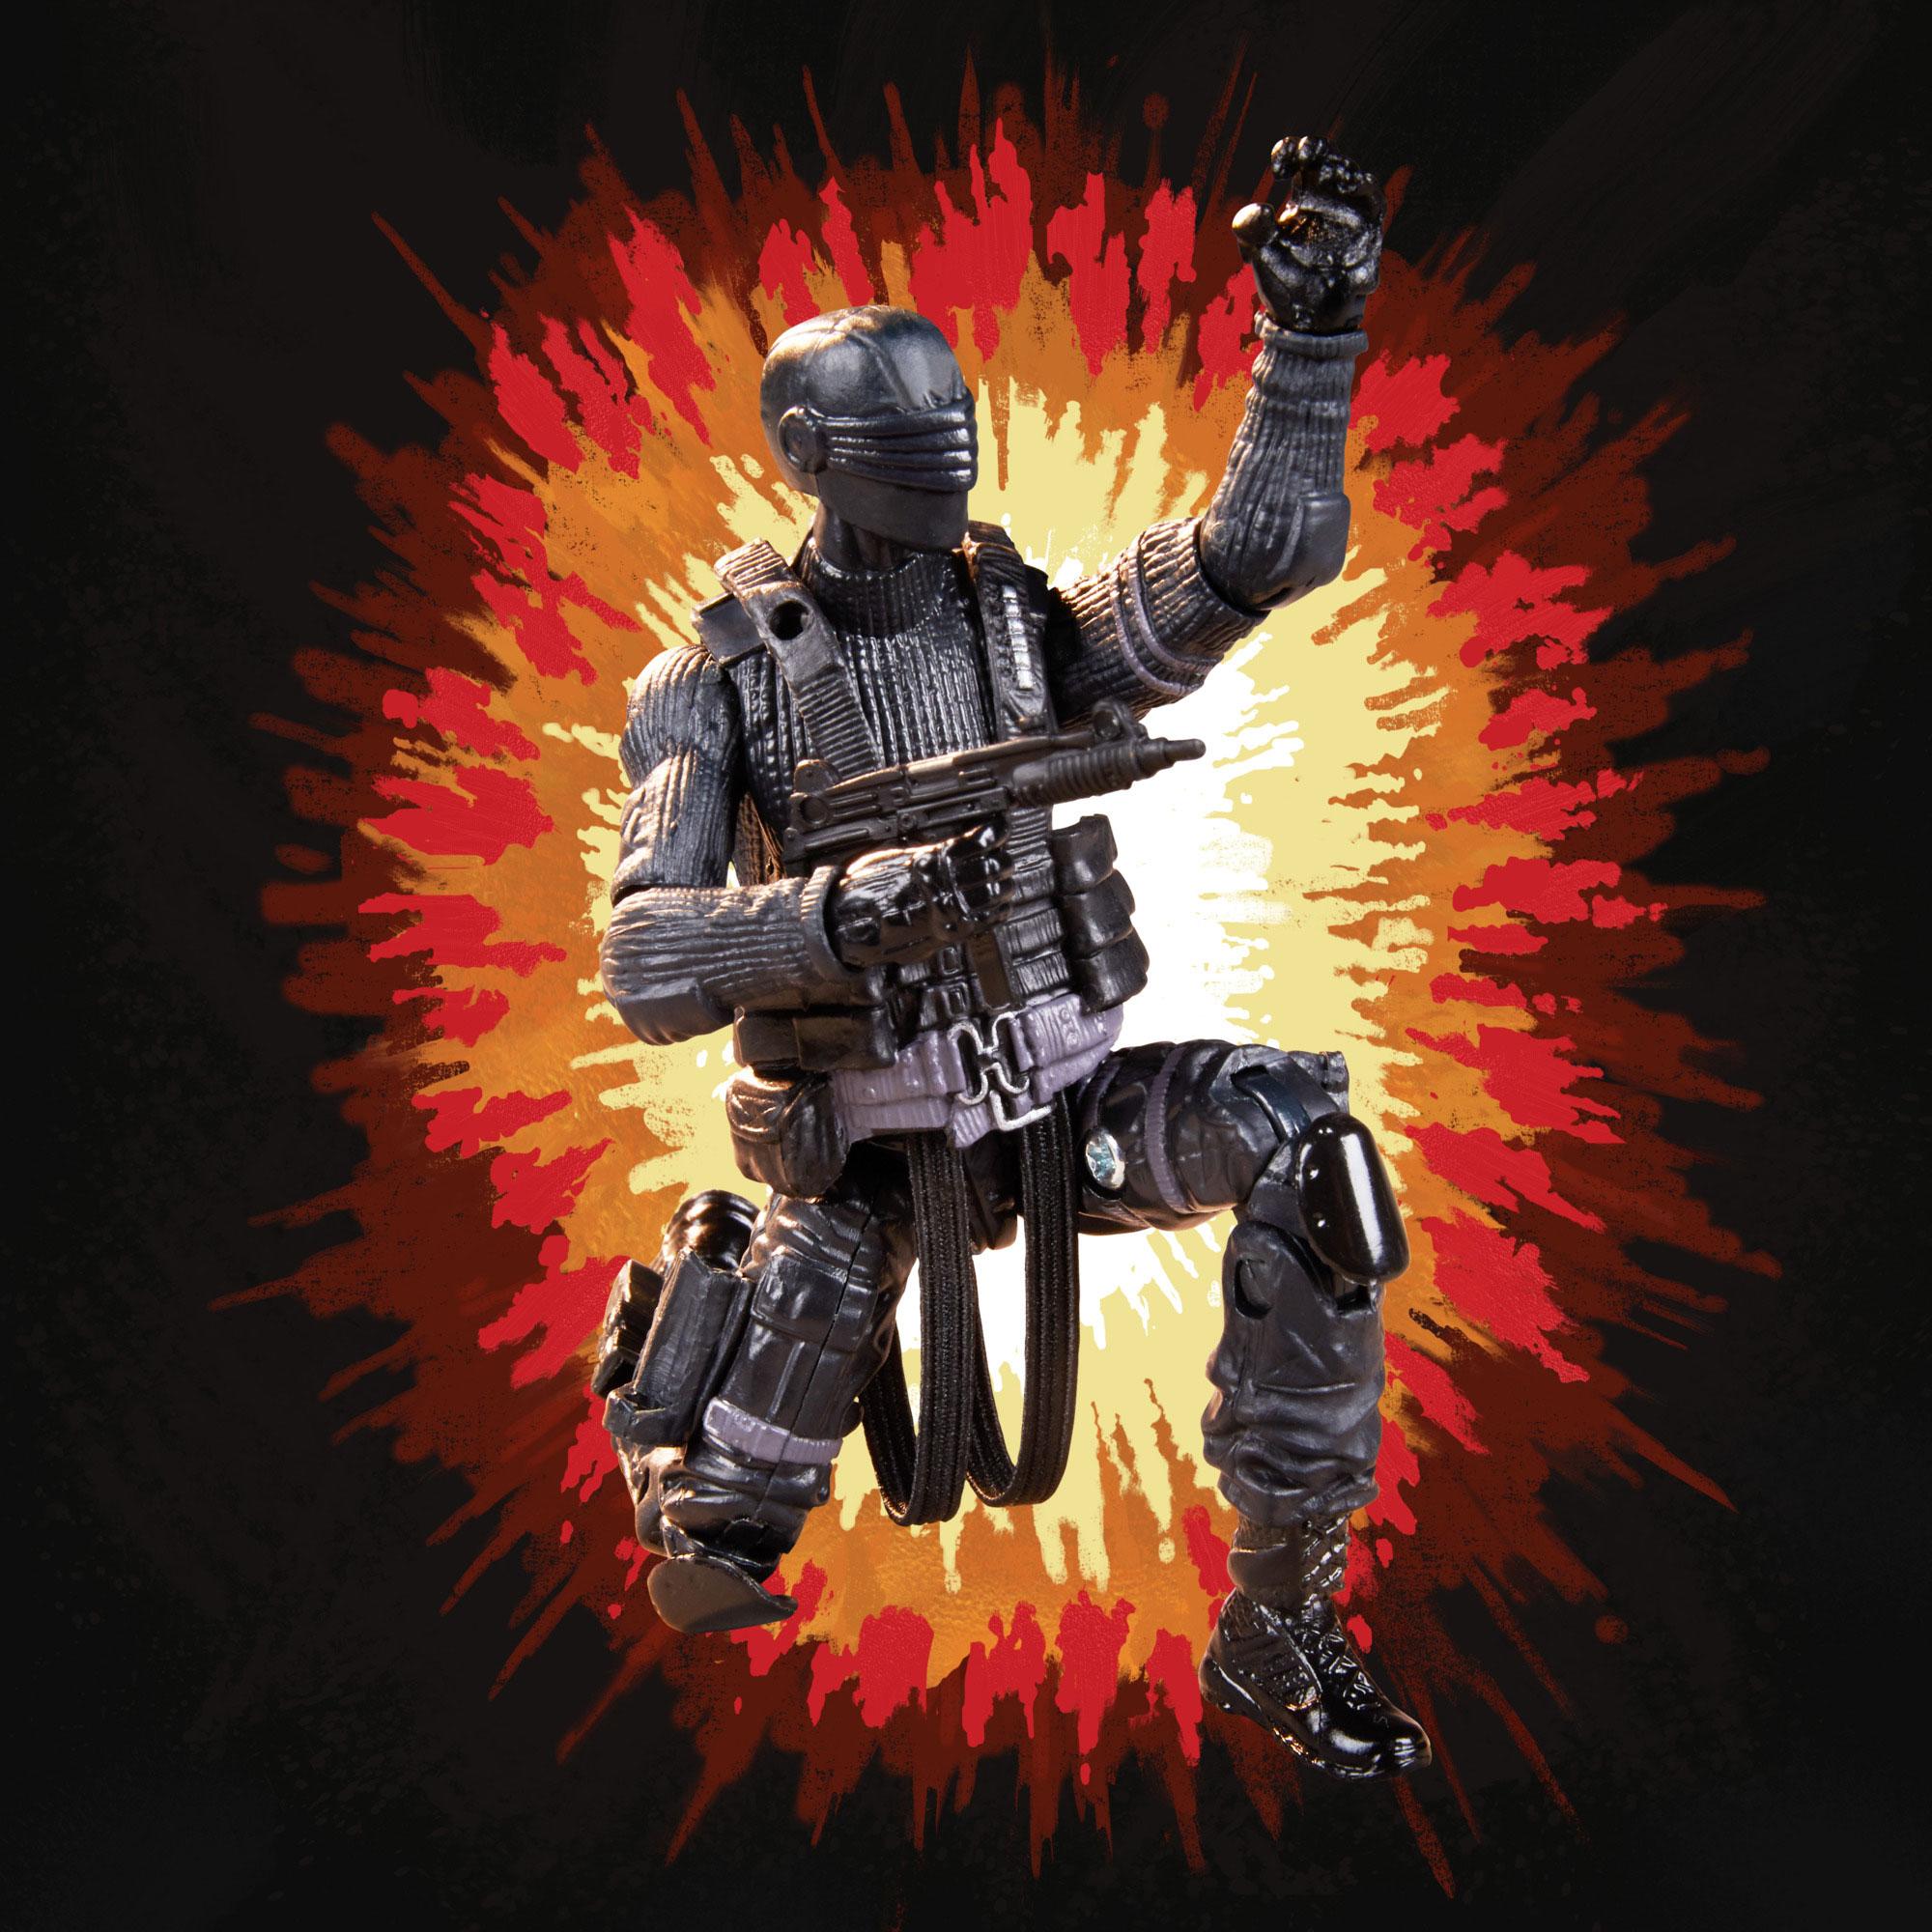 Snake-Eyes-GIJOE-Retro-Line-Walmart-Exclusive-action-figure-3